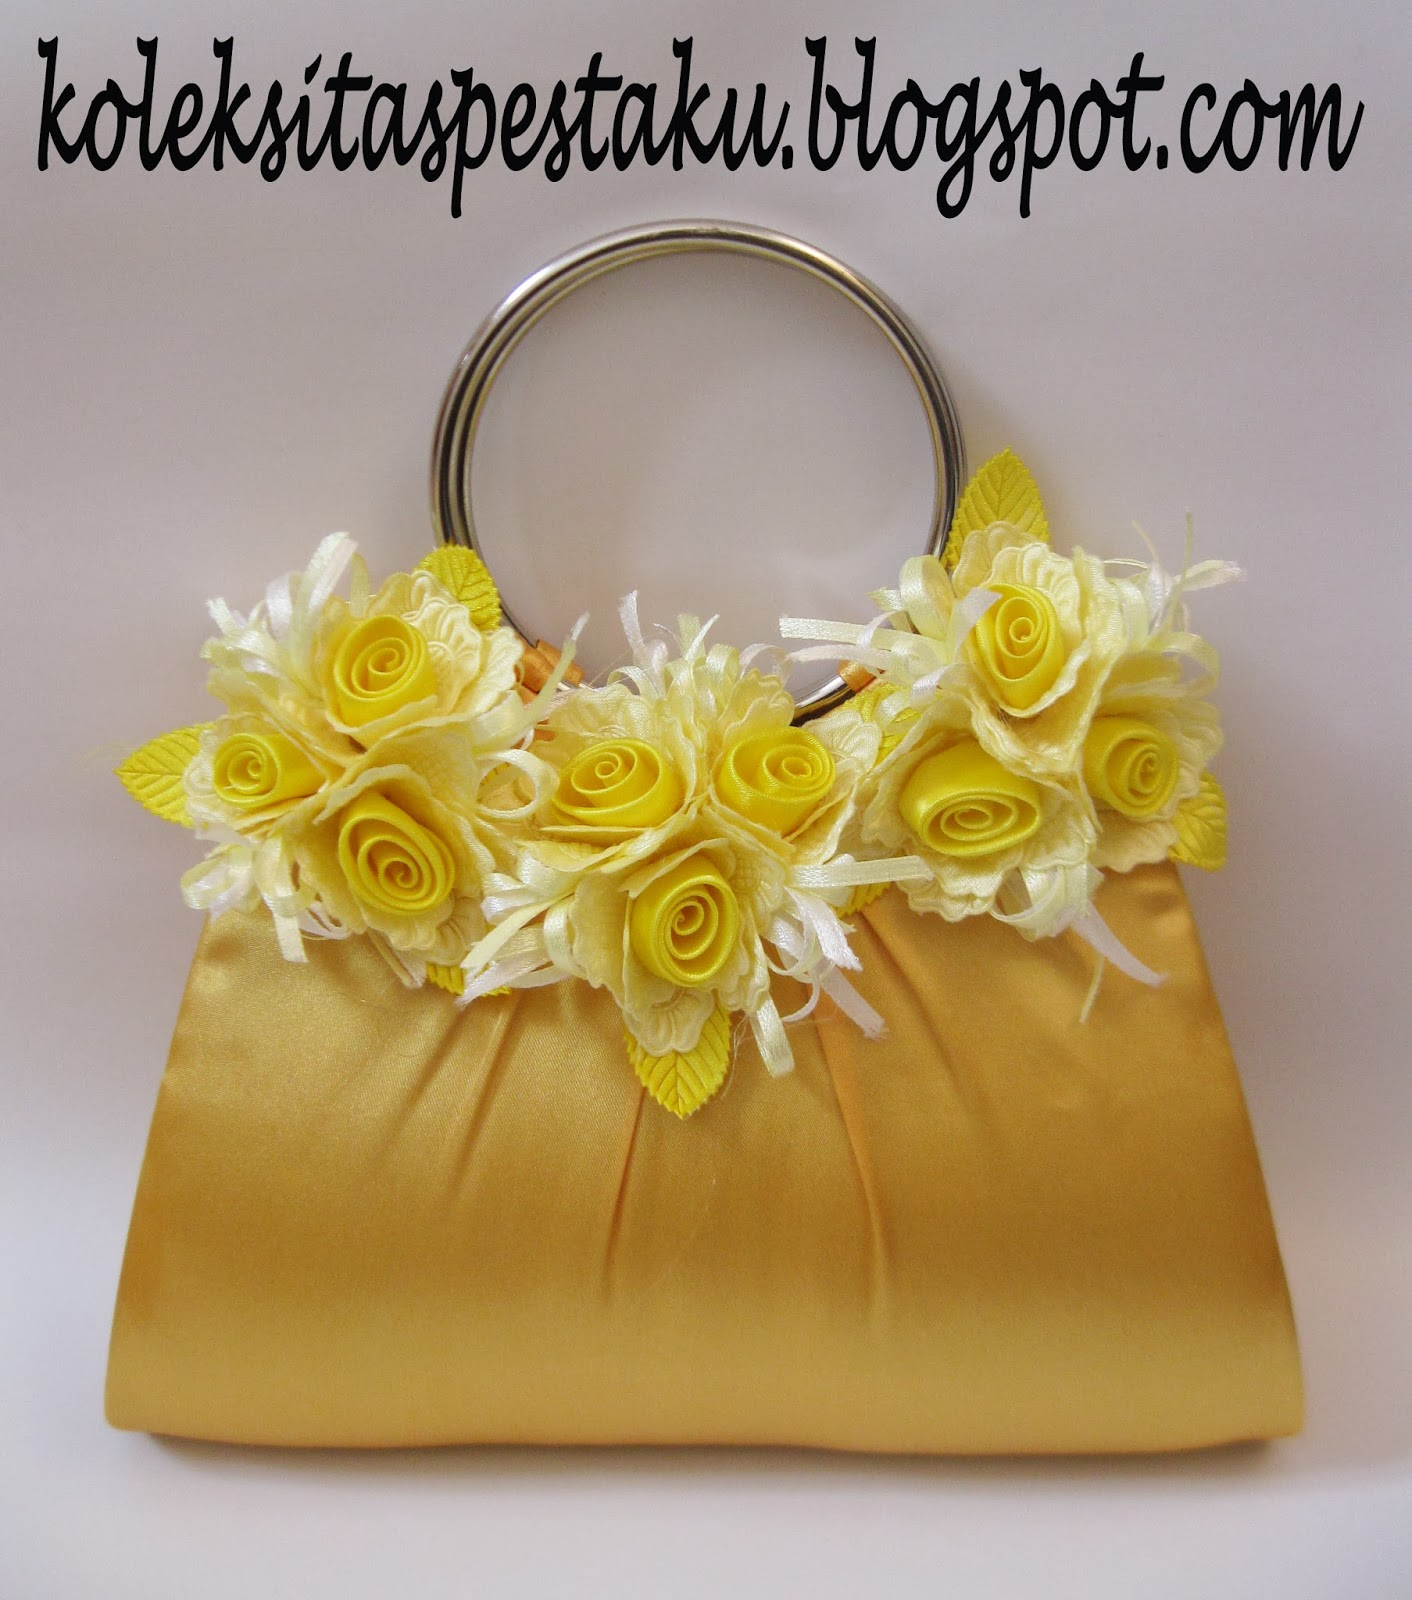 Tas Pesta Bunga Kuning Cantik